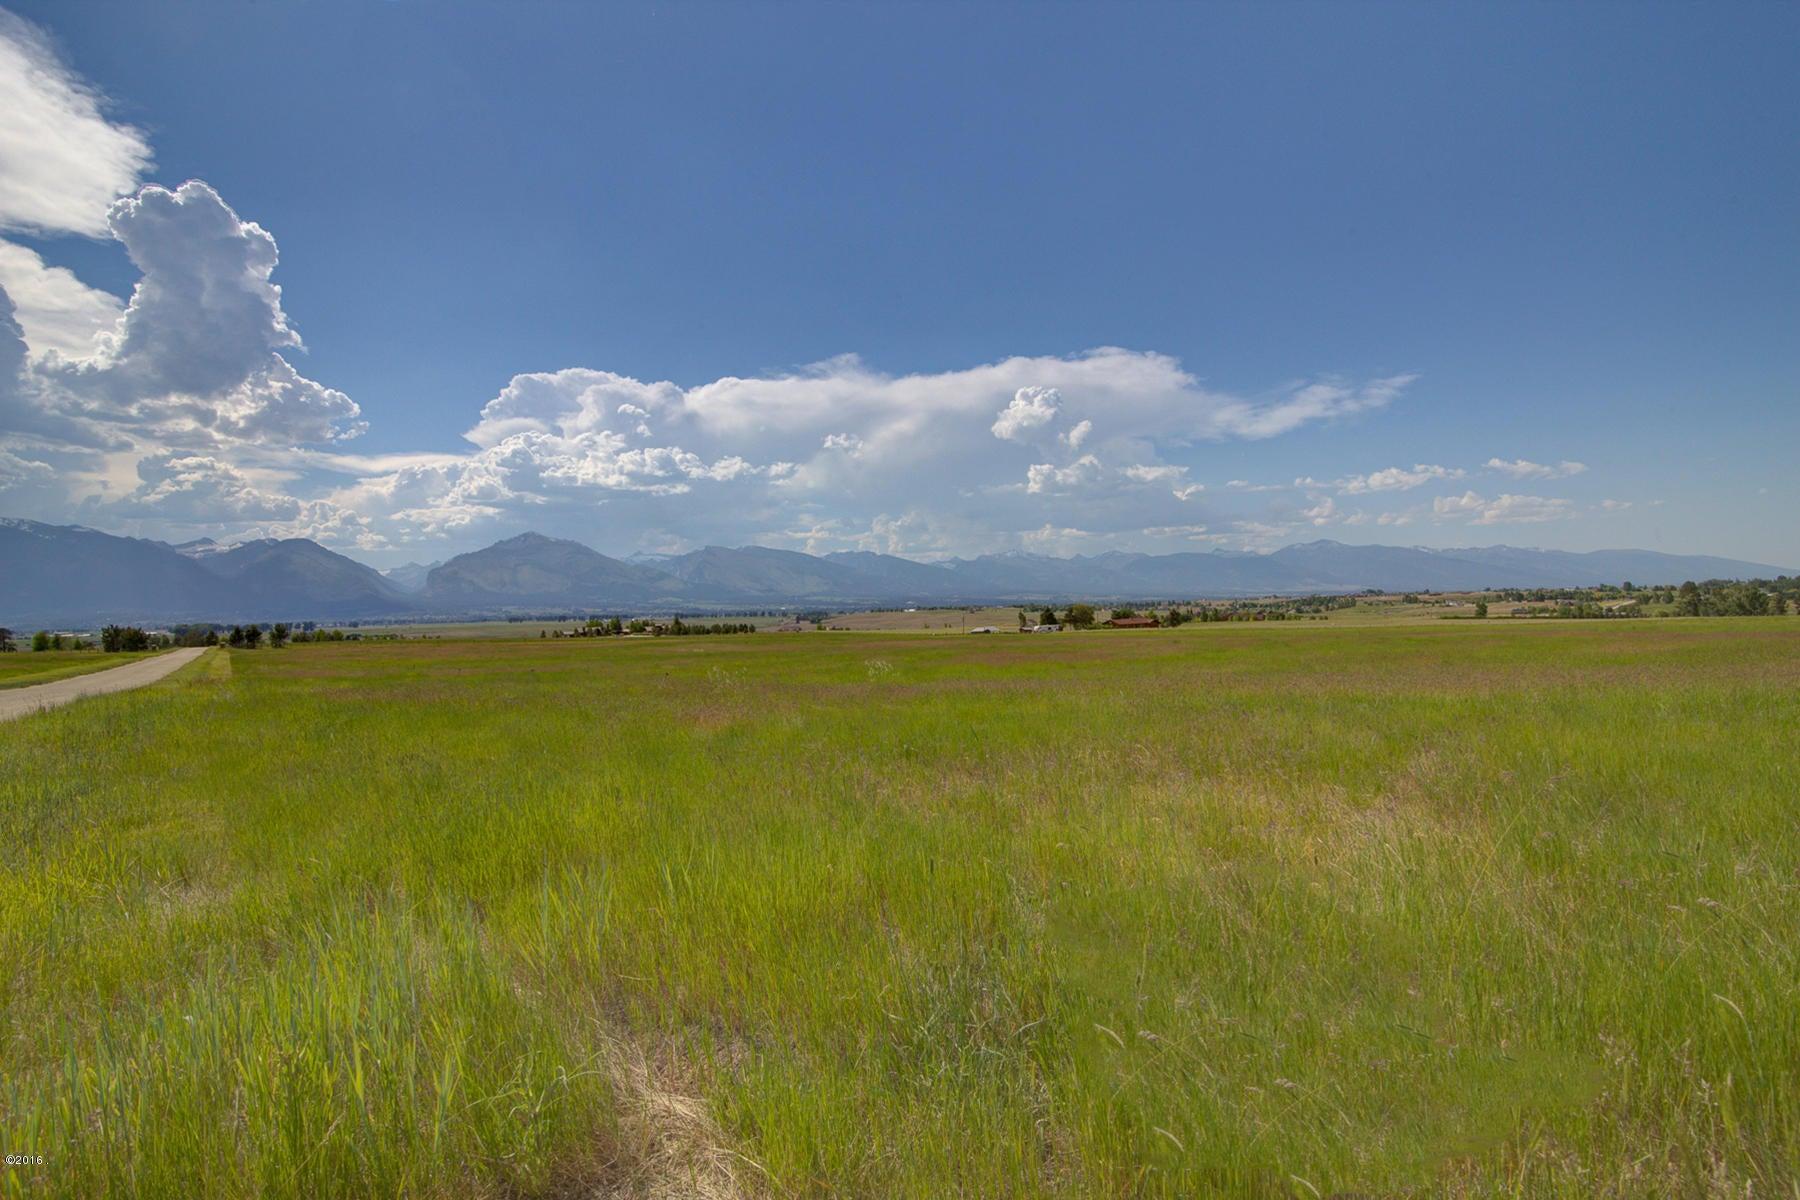 Land for Sale at Lot 7b Palfiena Trail Lot 7b Palfiena Trail Hamilton, Montana 59840 United States